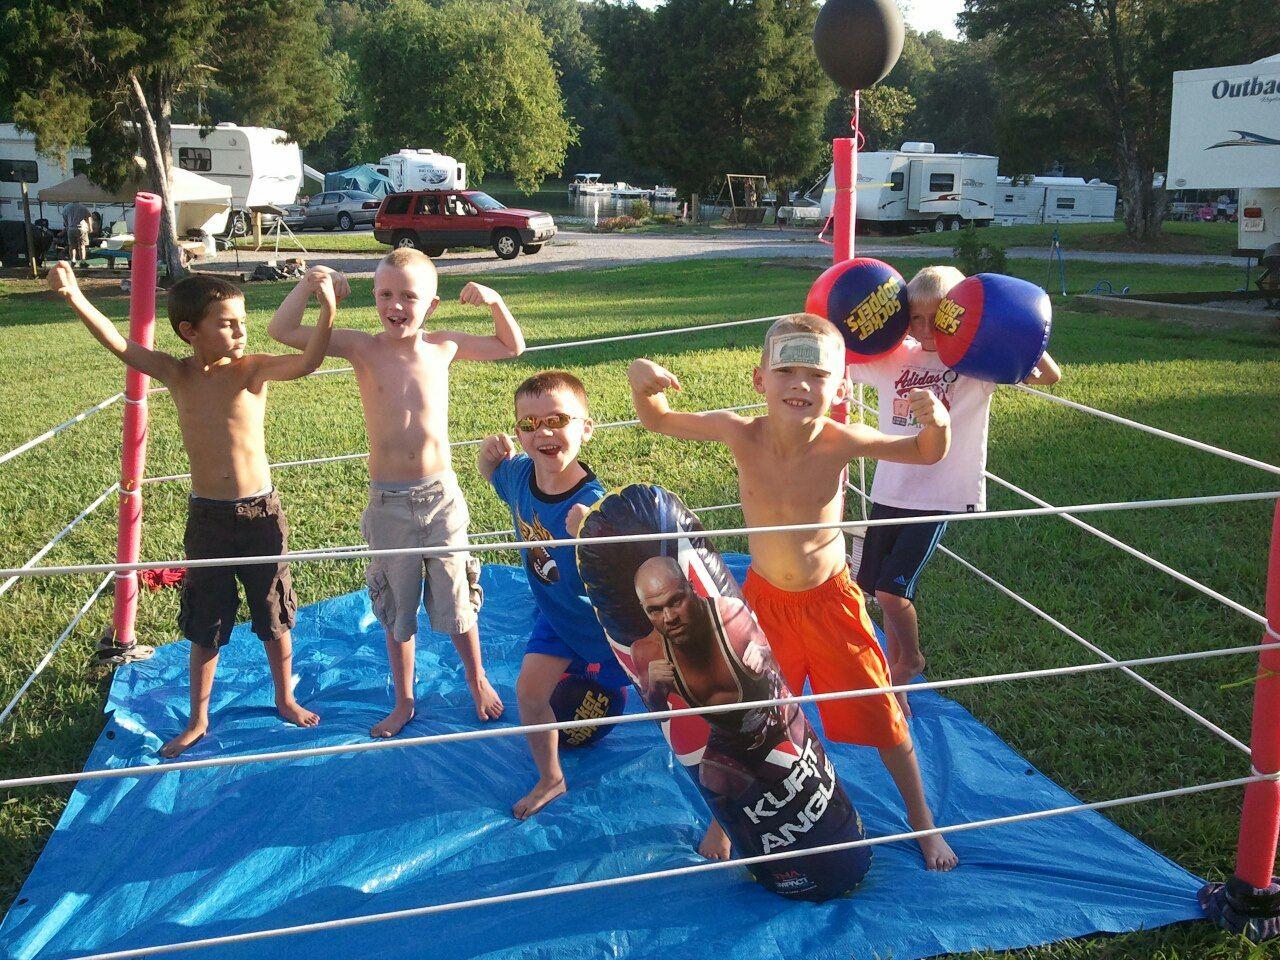 Wrestling Ring! Great little boys birthday party idea! - Wrestling Ring! Great Little Boys Birthday Party Idea! Holidays